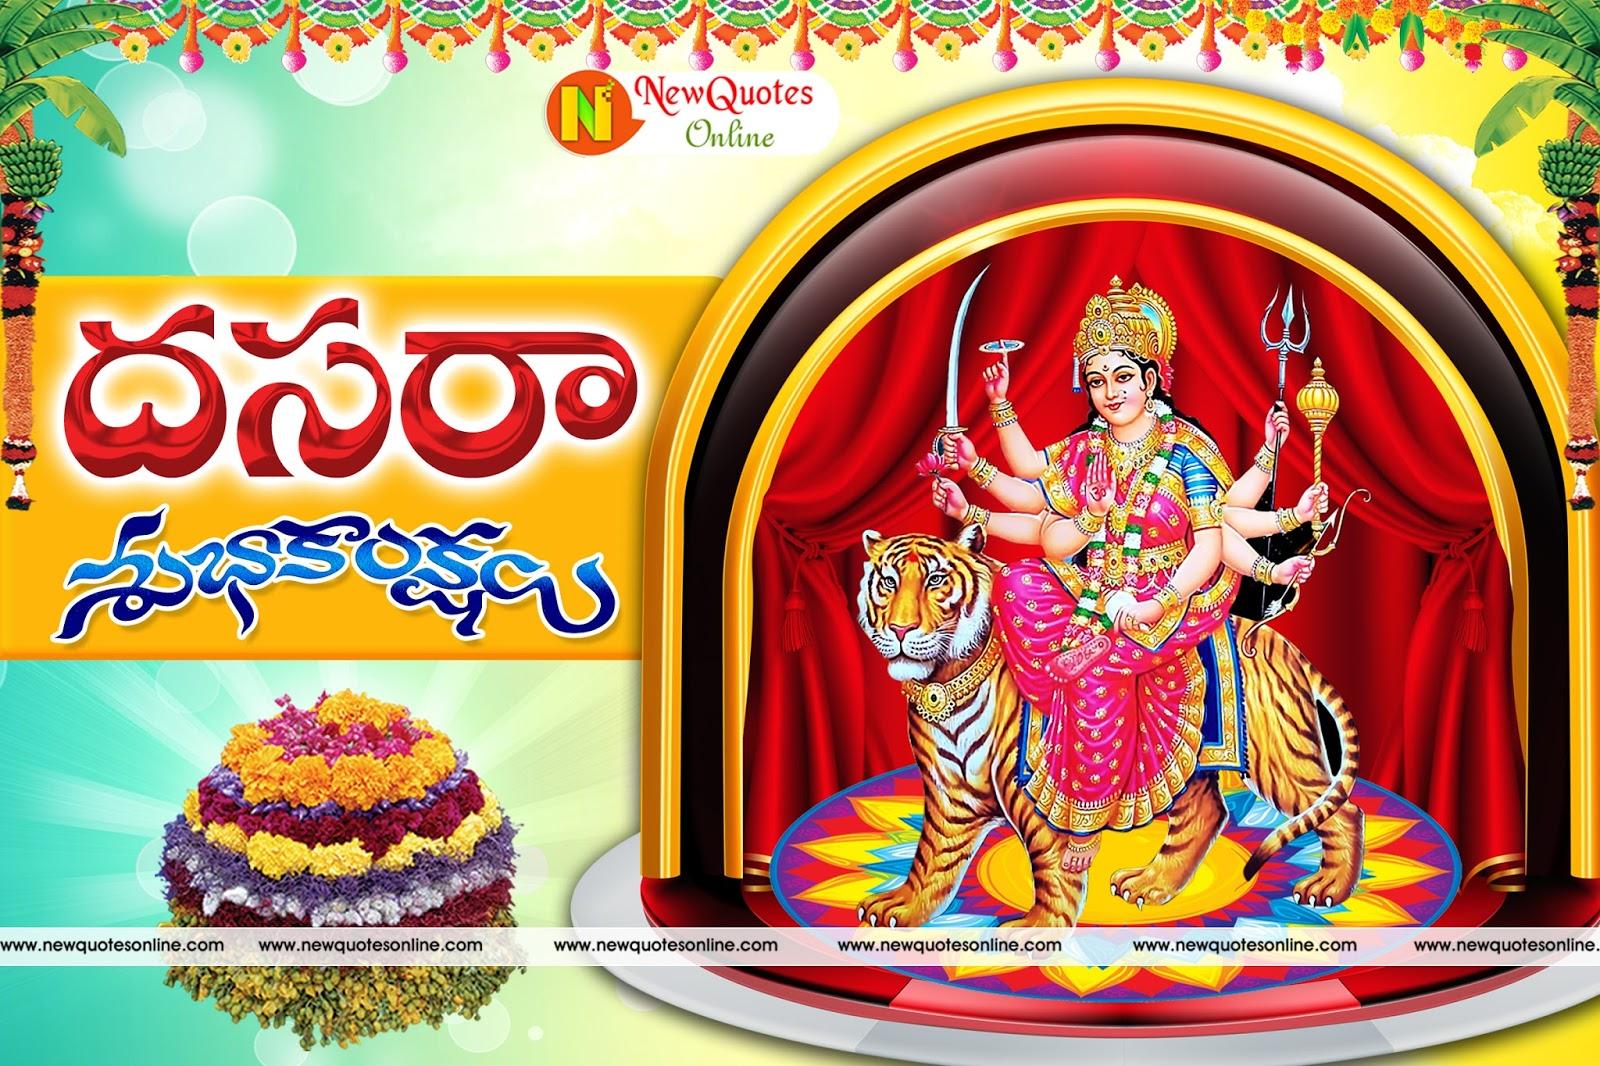 Happy dussehra telugu quotes with images free download dasara vijayadashami 2016 quotes in telugu dasara wishes greetings m4hsunfo